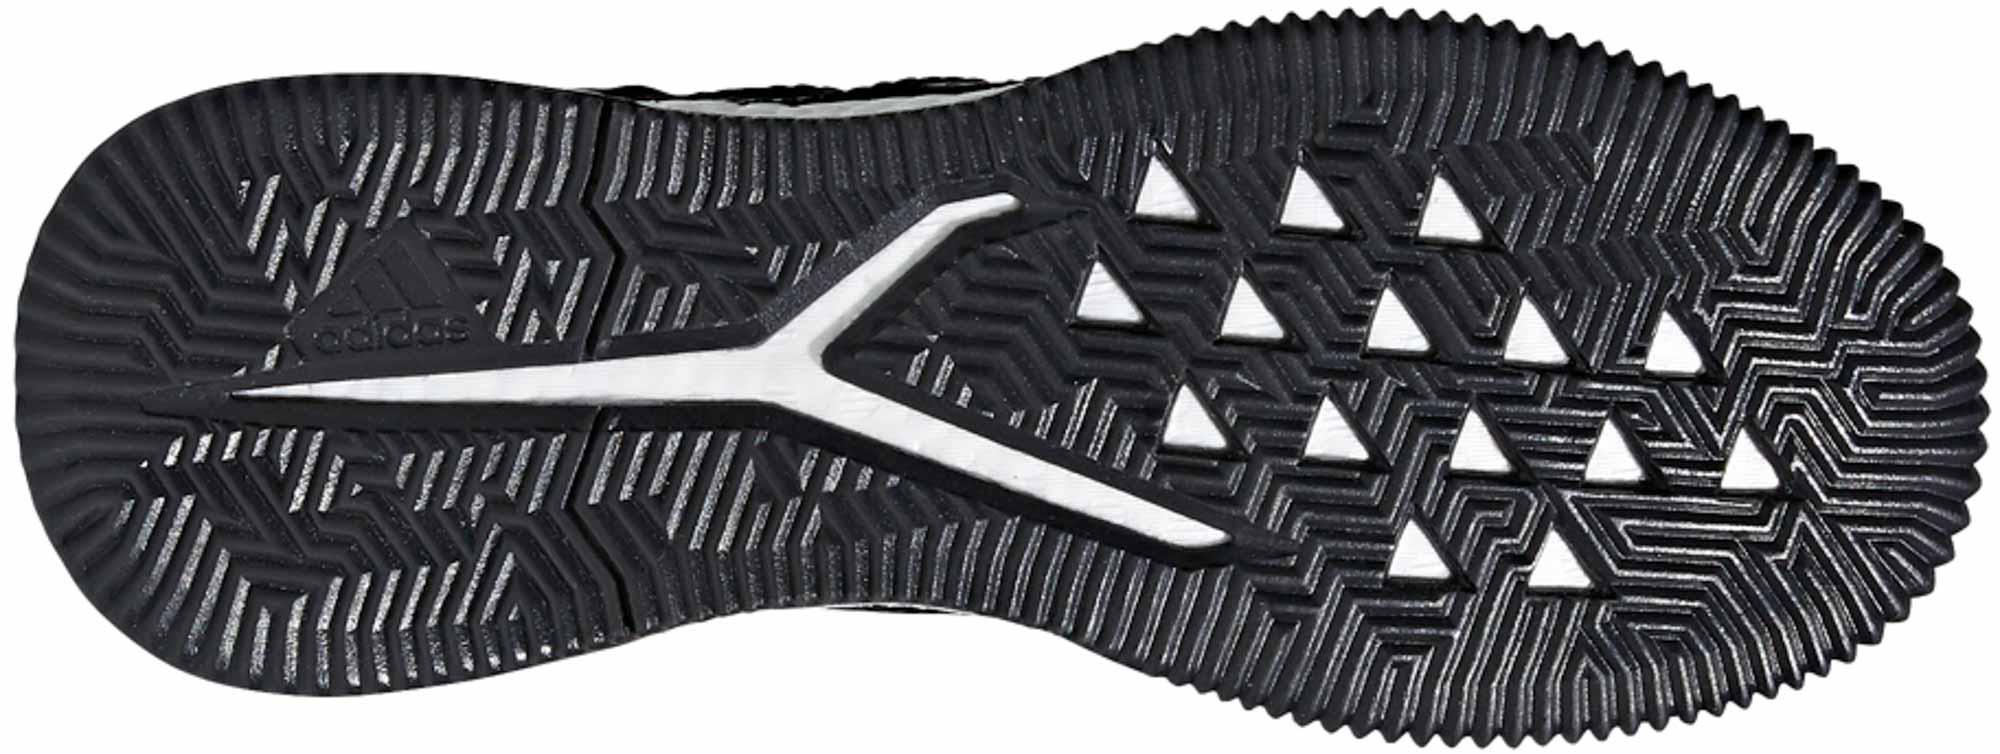 adidas Predator Tango 18.1 TR BlackWhite Cleatsxp